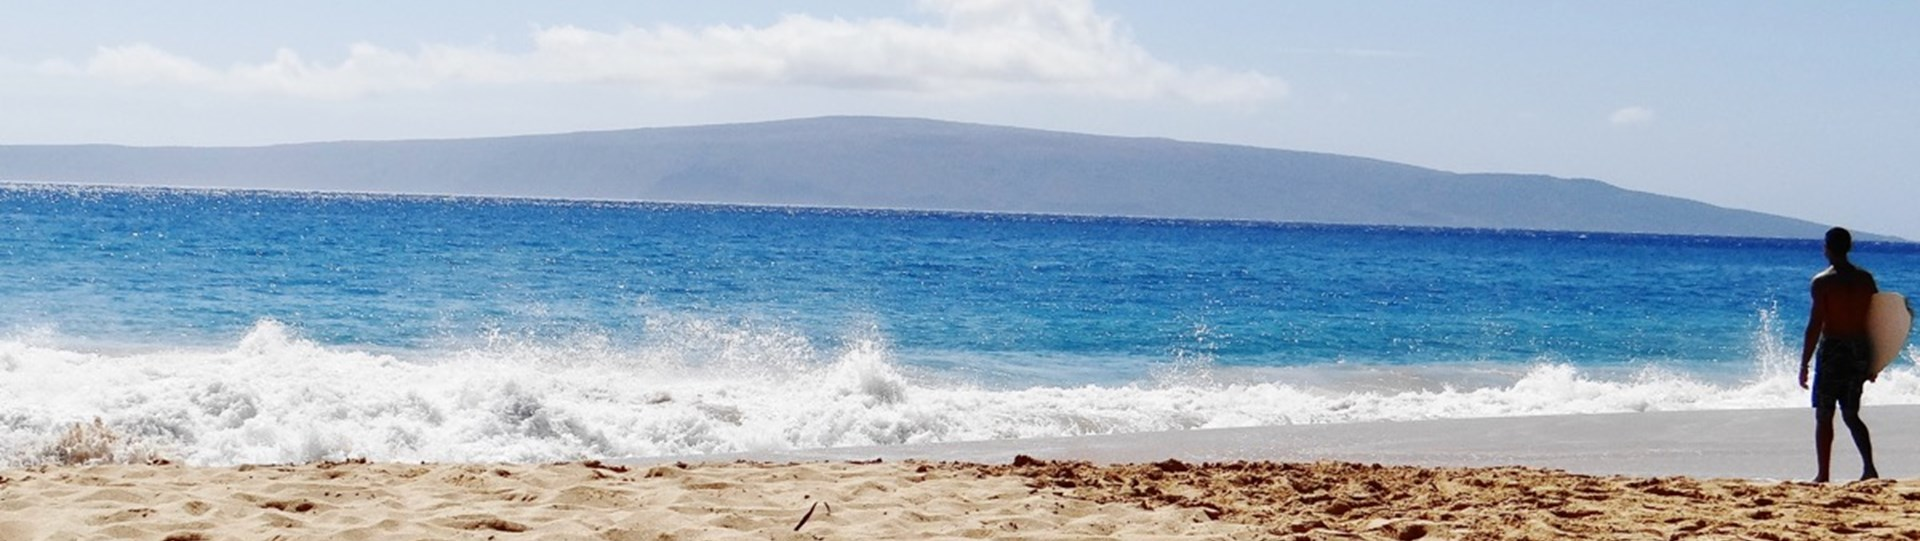 Verenigde Staten - Hawaii